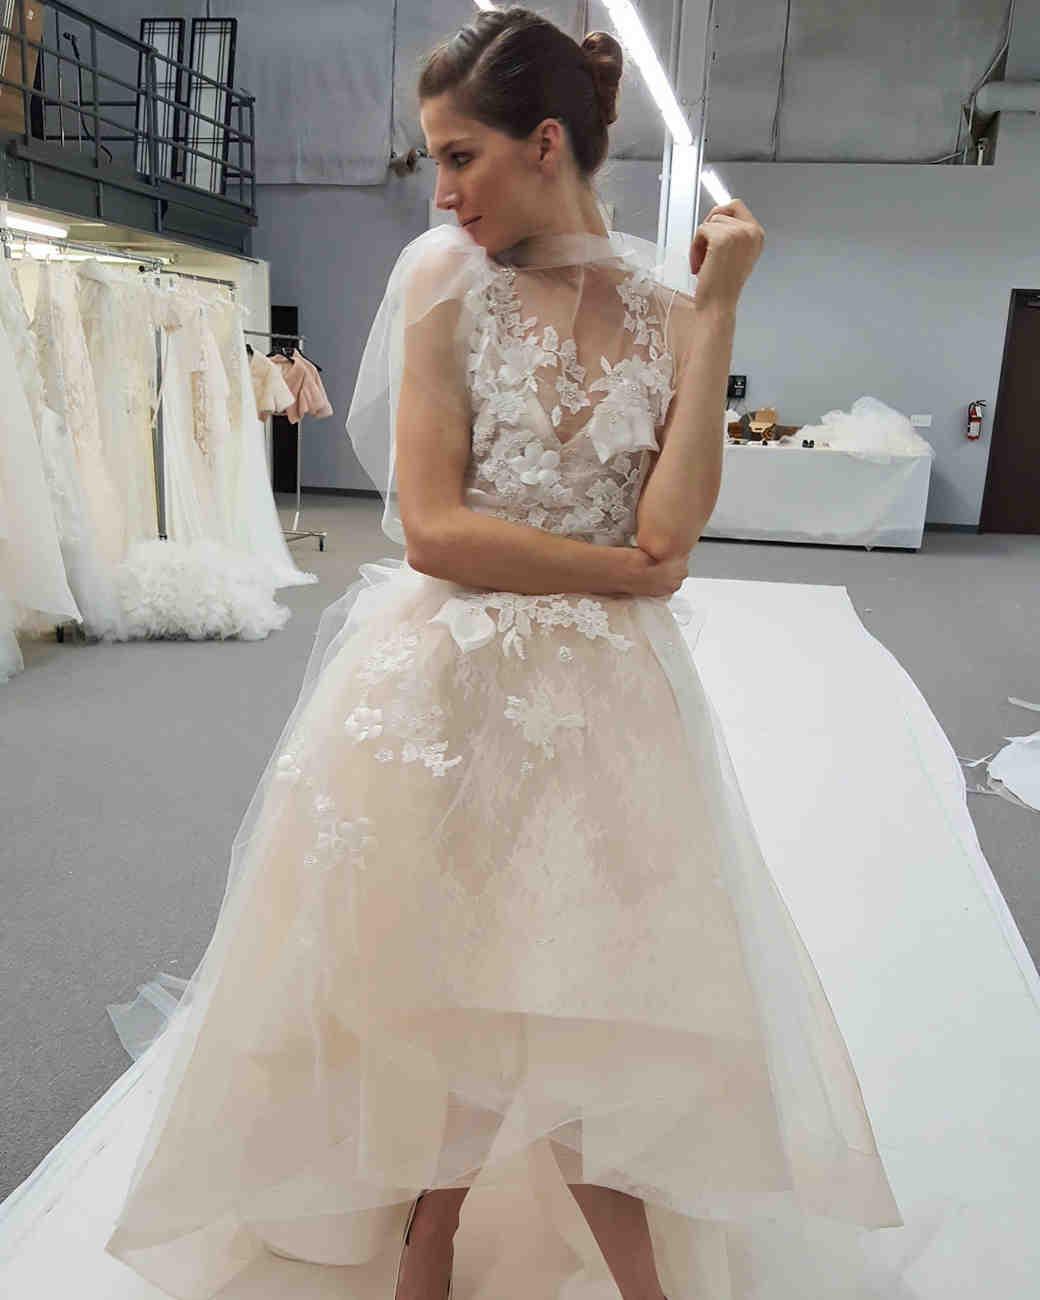 monique-lhuillier-model-bridal-market-ss17-0416.jpg